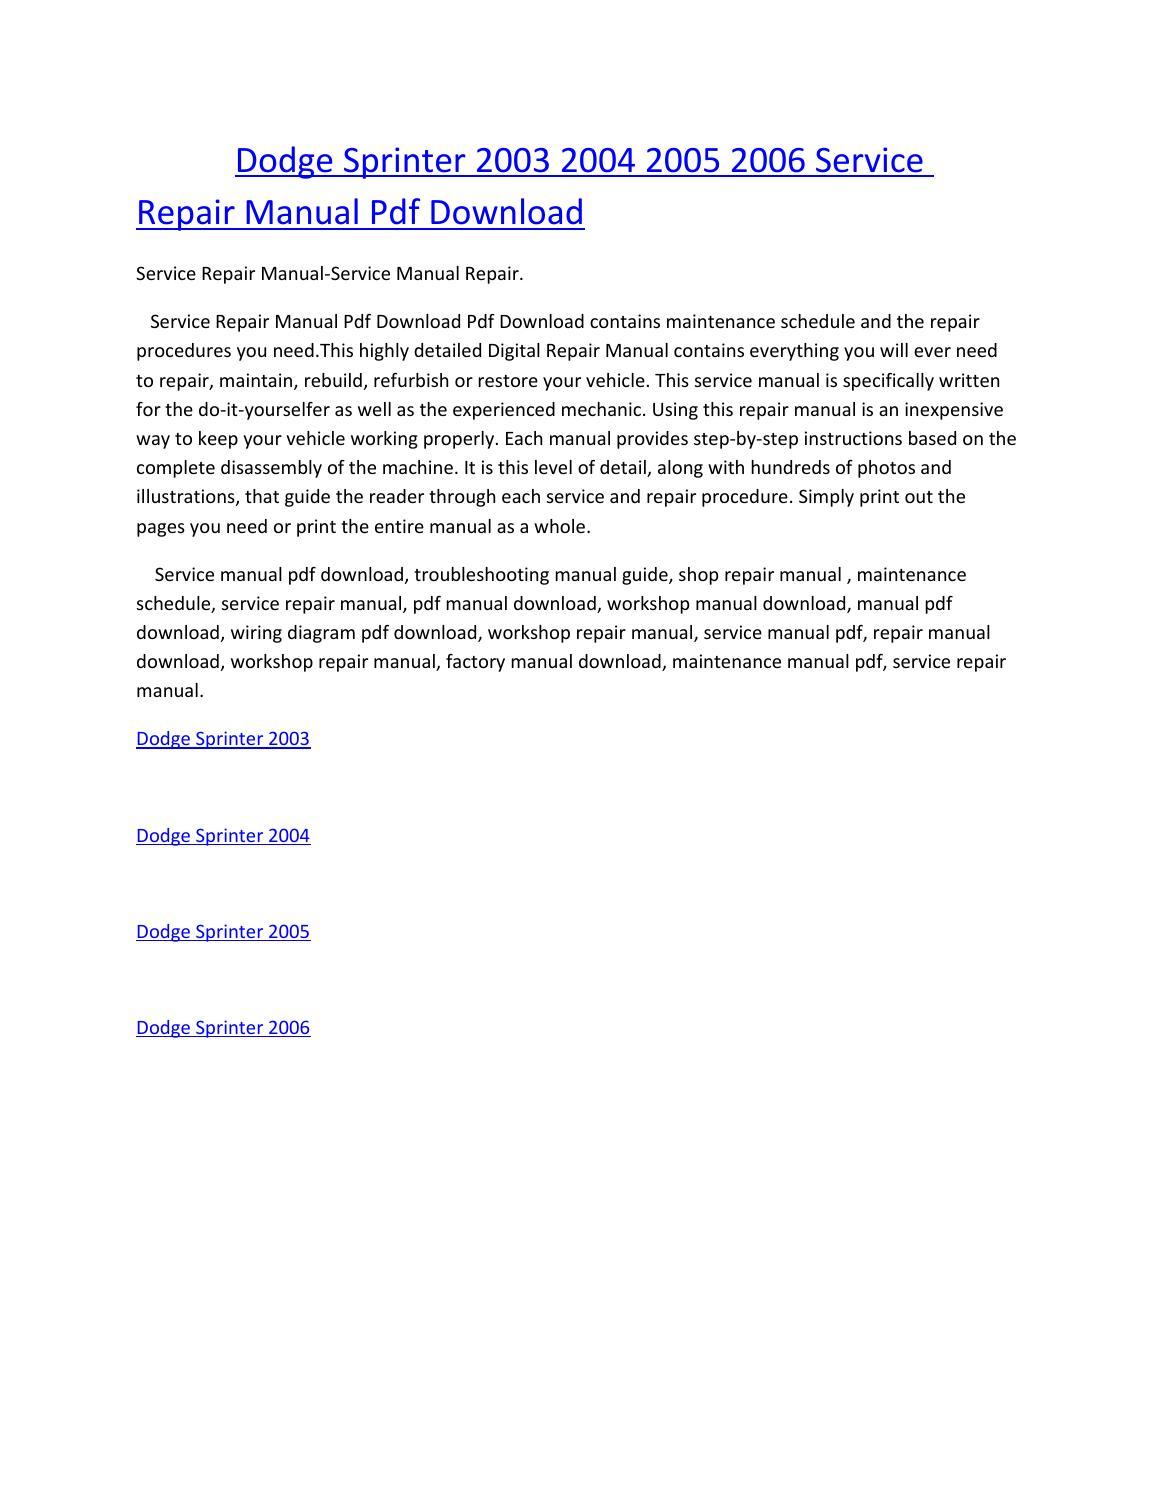 Dodge sprinter 2003 2004 2005 2006 service manual repair pdf download by  amurgului - issuu